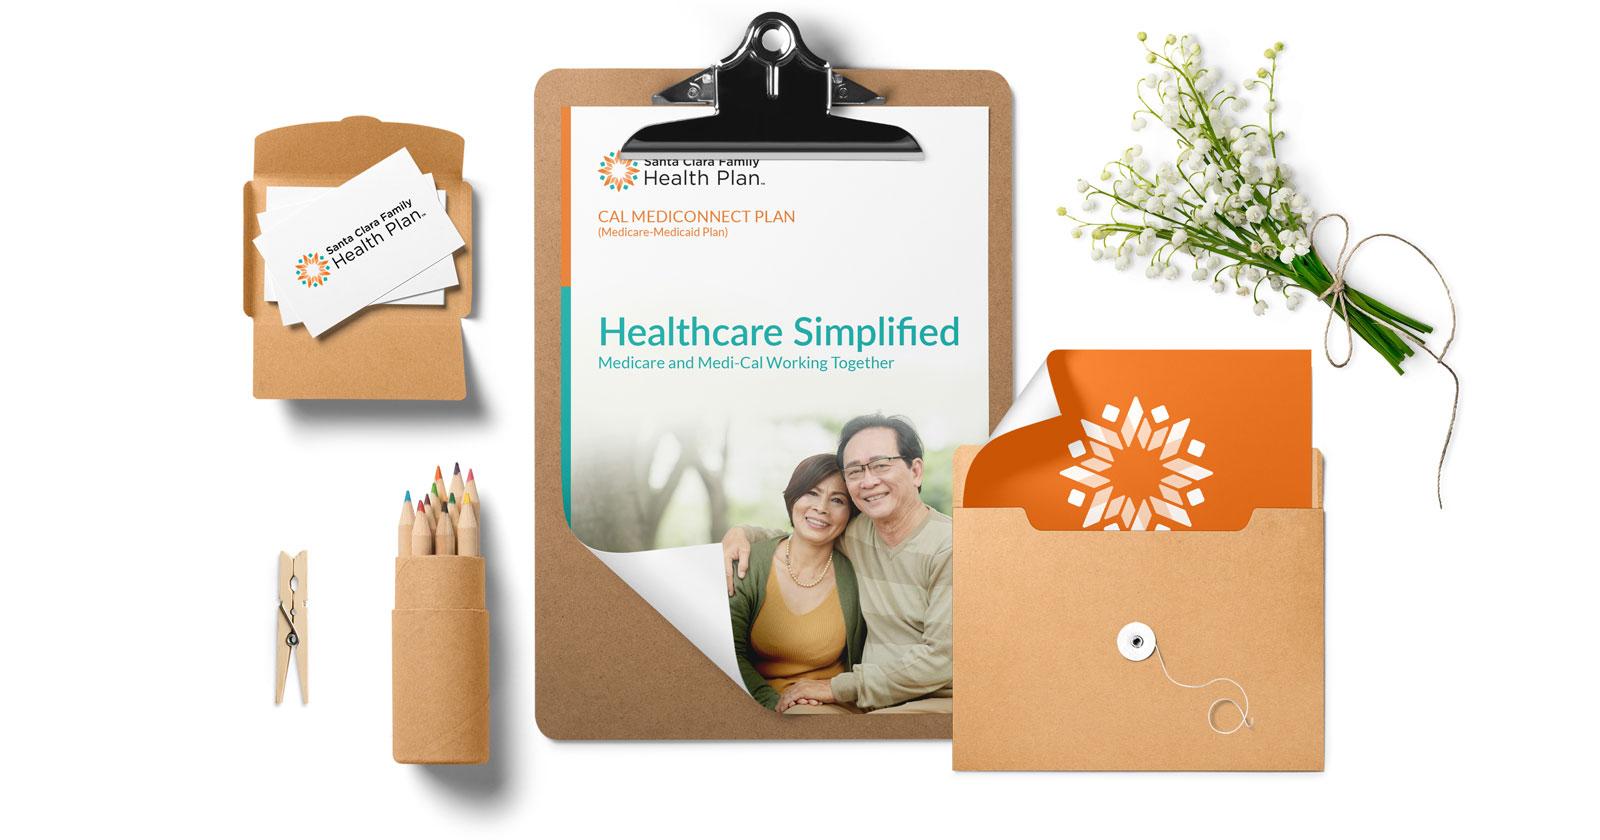 santa clara family health plan brand logo design stationery set